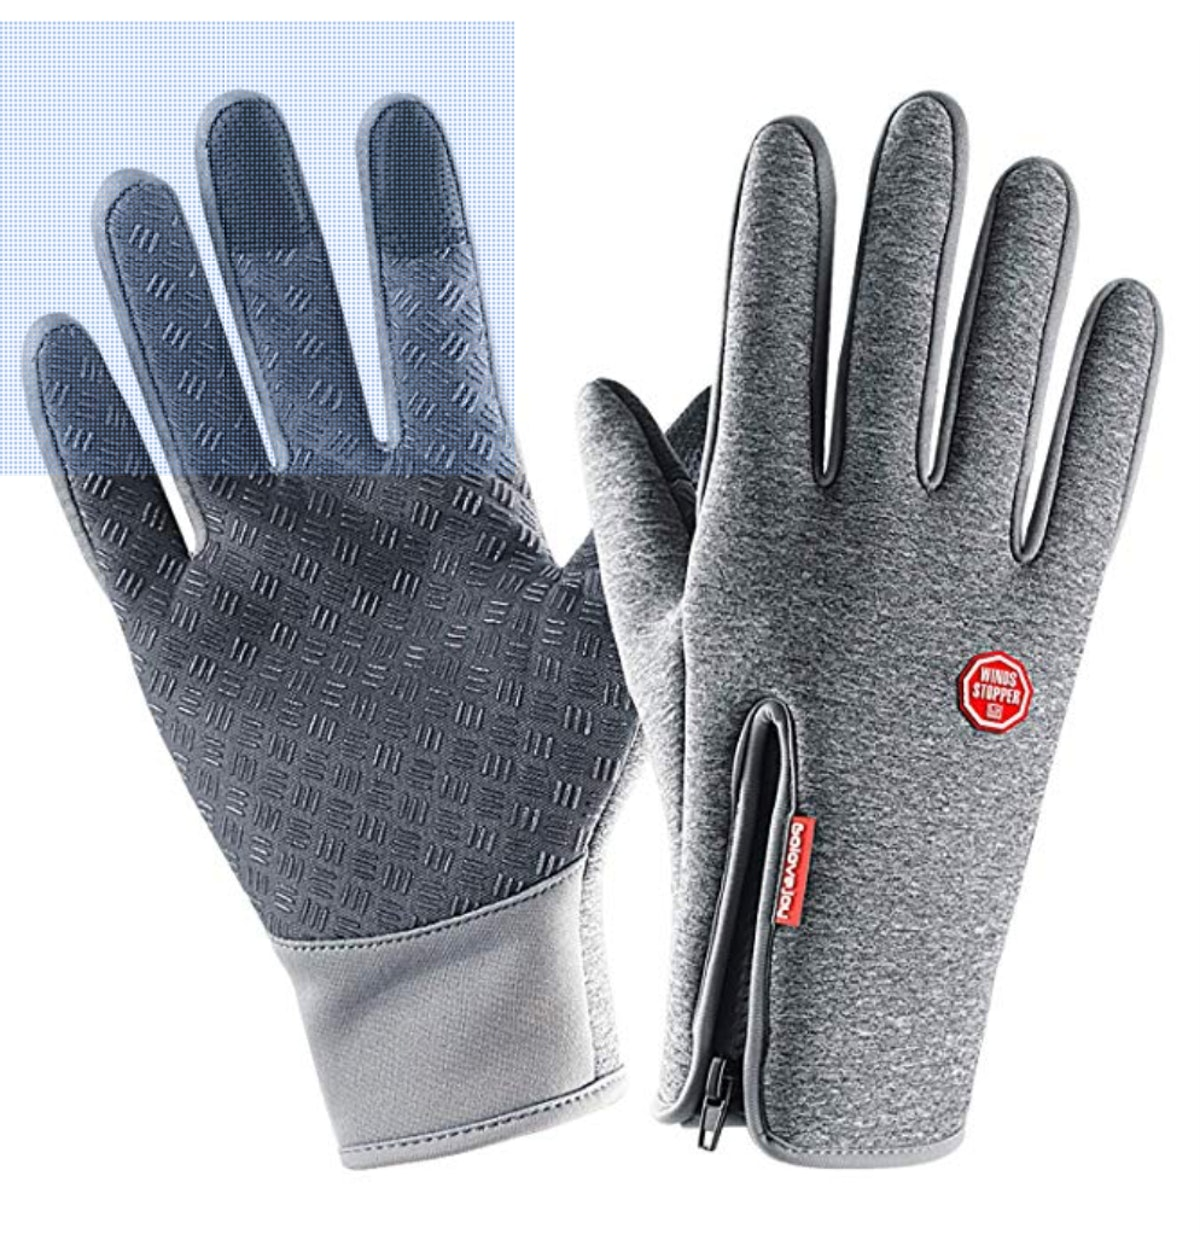 Lanyi Waterproof Anti-Slip Gloves